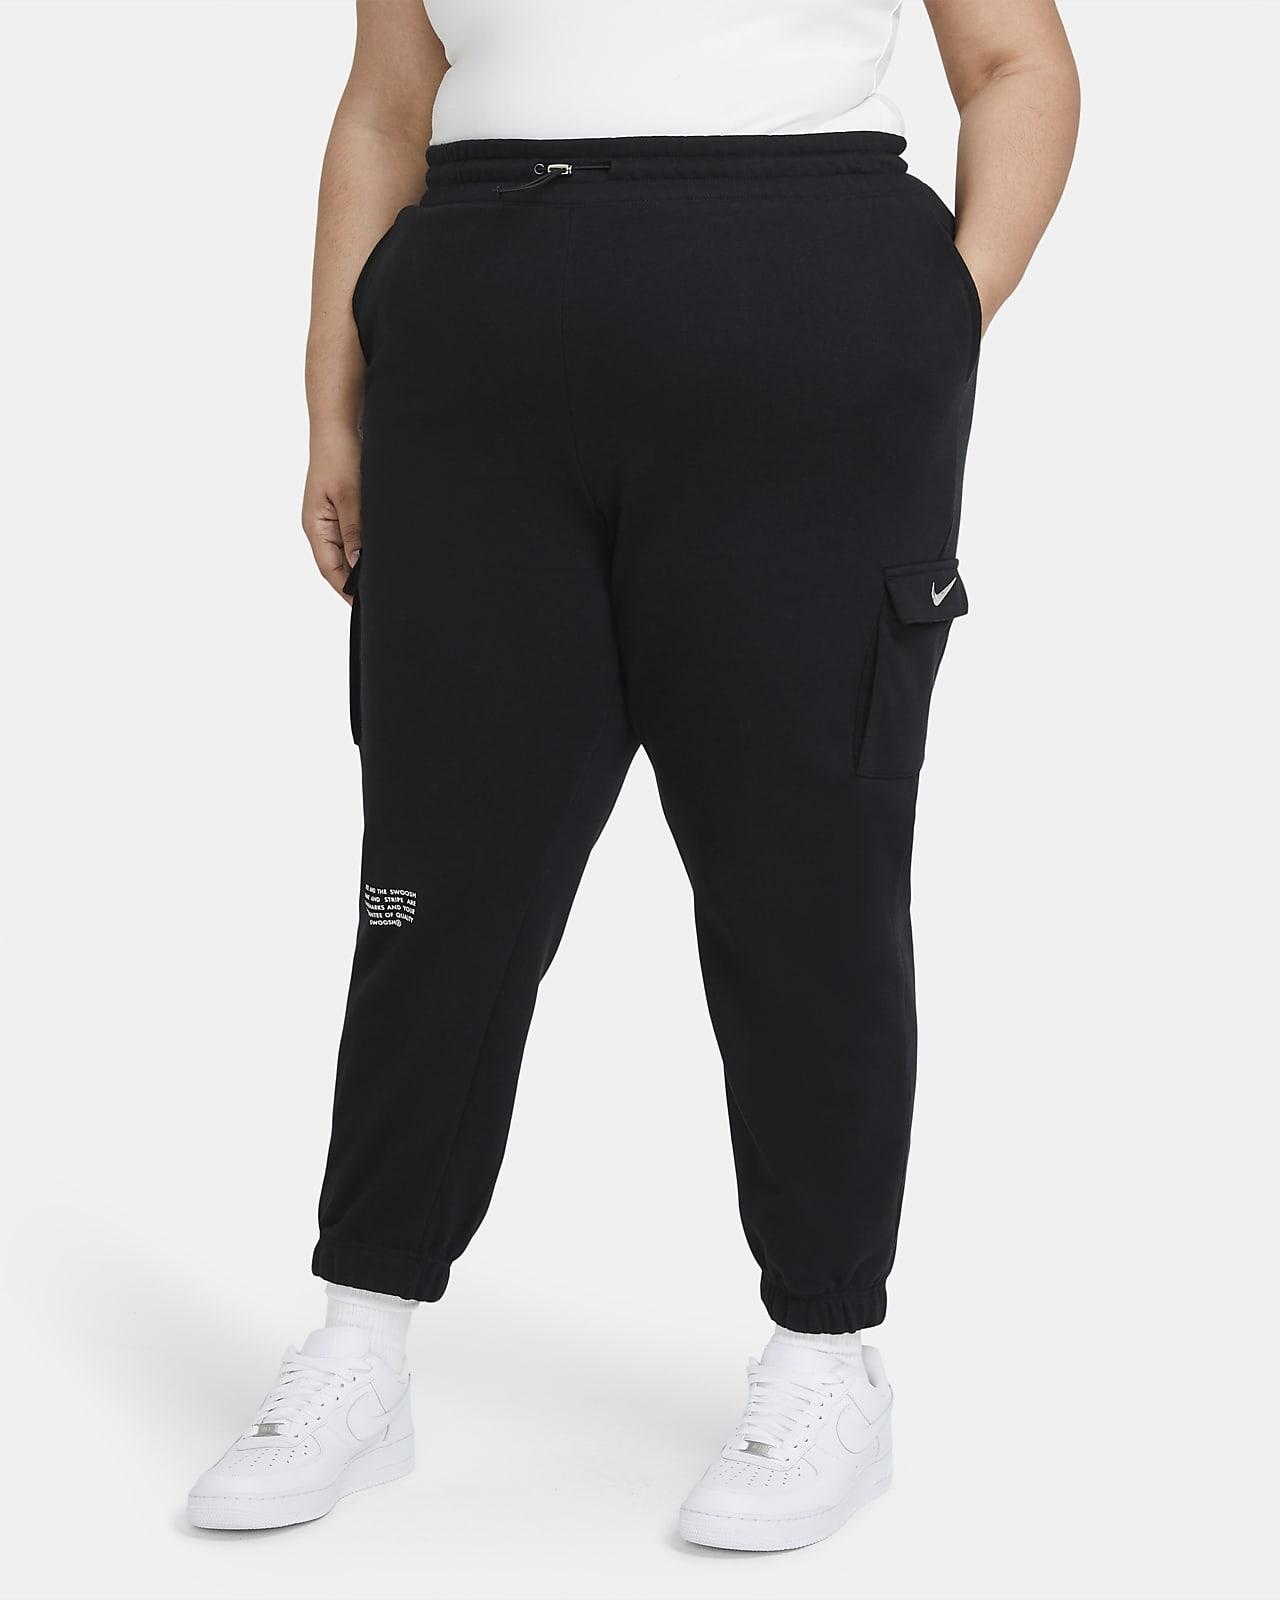 Pantalon Nike Sportswear Swoosh pour Femme (grande taille)